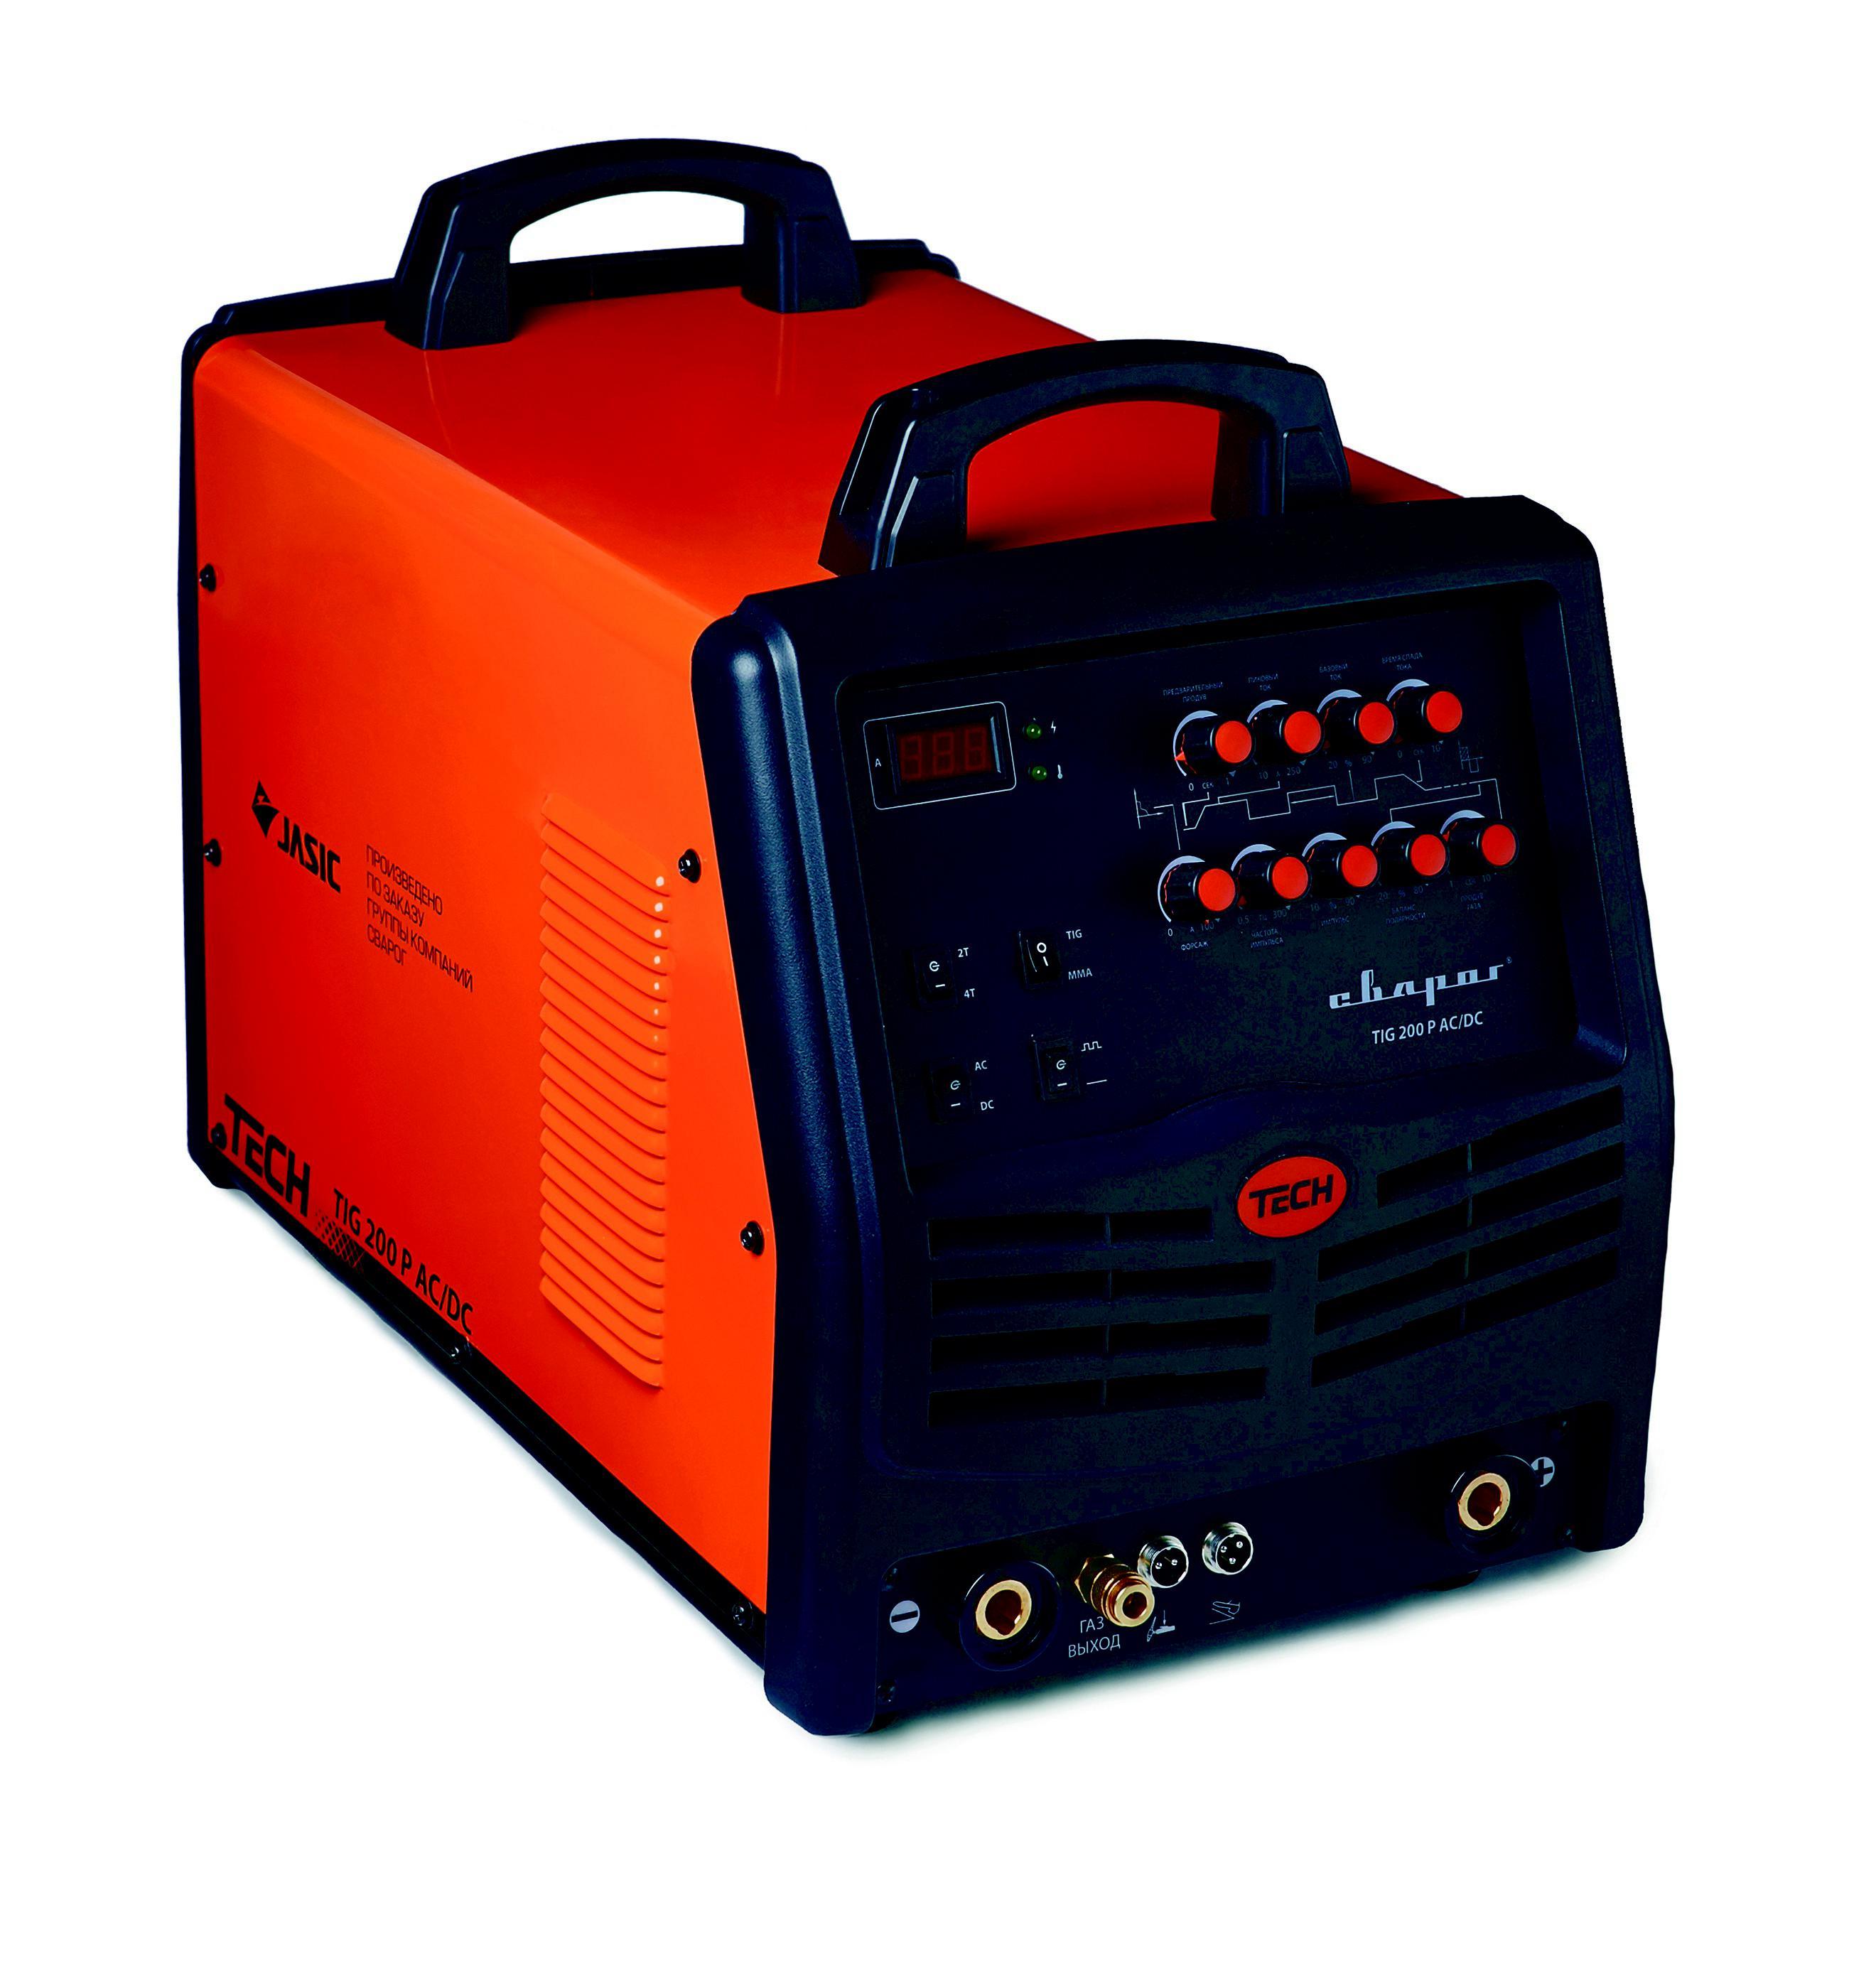 Сварочный аппарат СВАРОГ Tech tig 200 p ac/dc (e101) сварочный аппарат сварог pro tig 200 p dsp w212